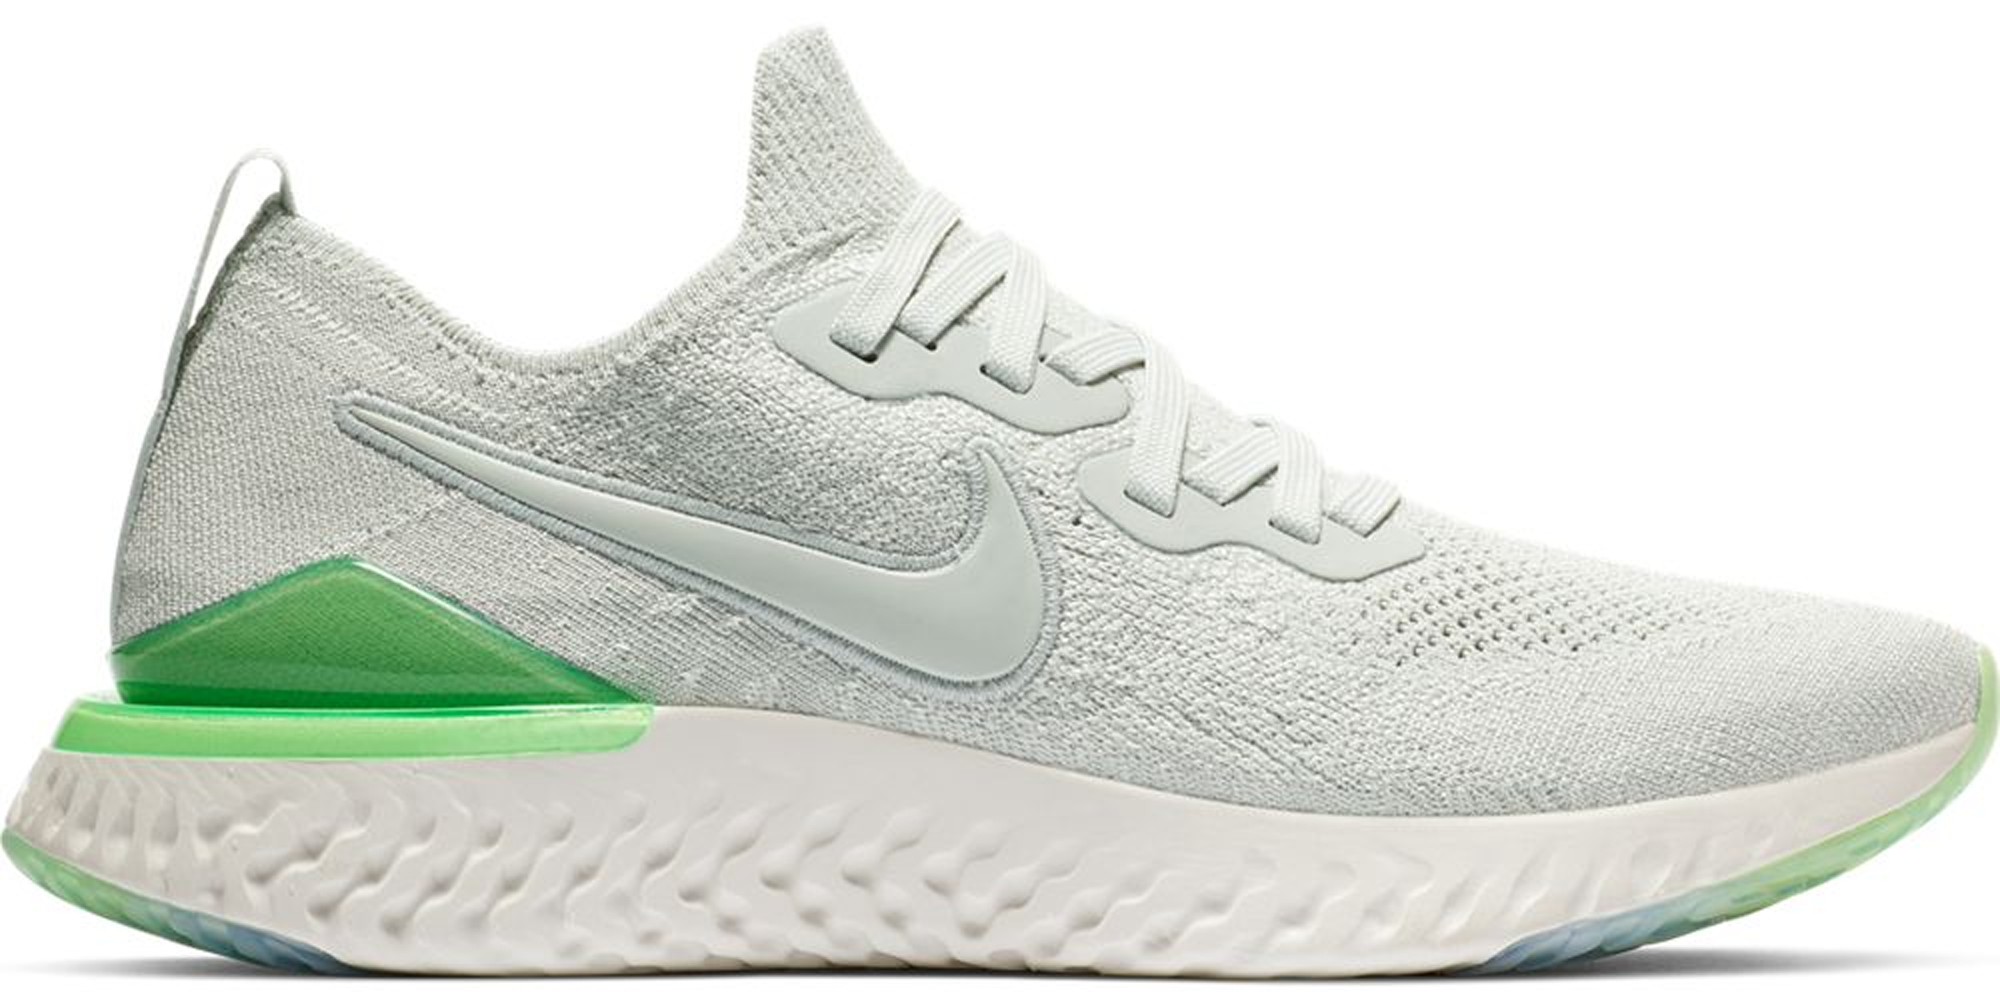 Nike Epic React Flyknit 2 Light Silver